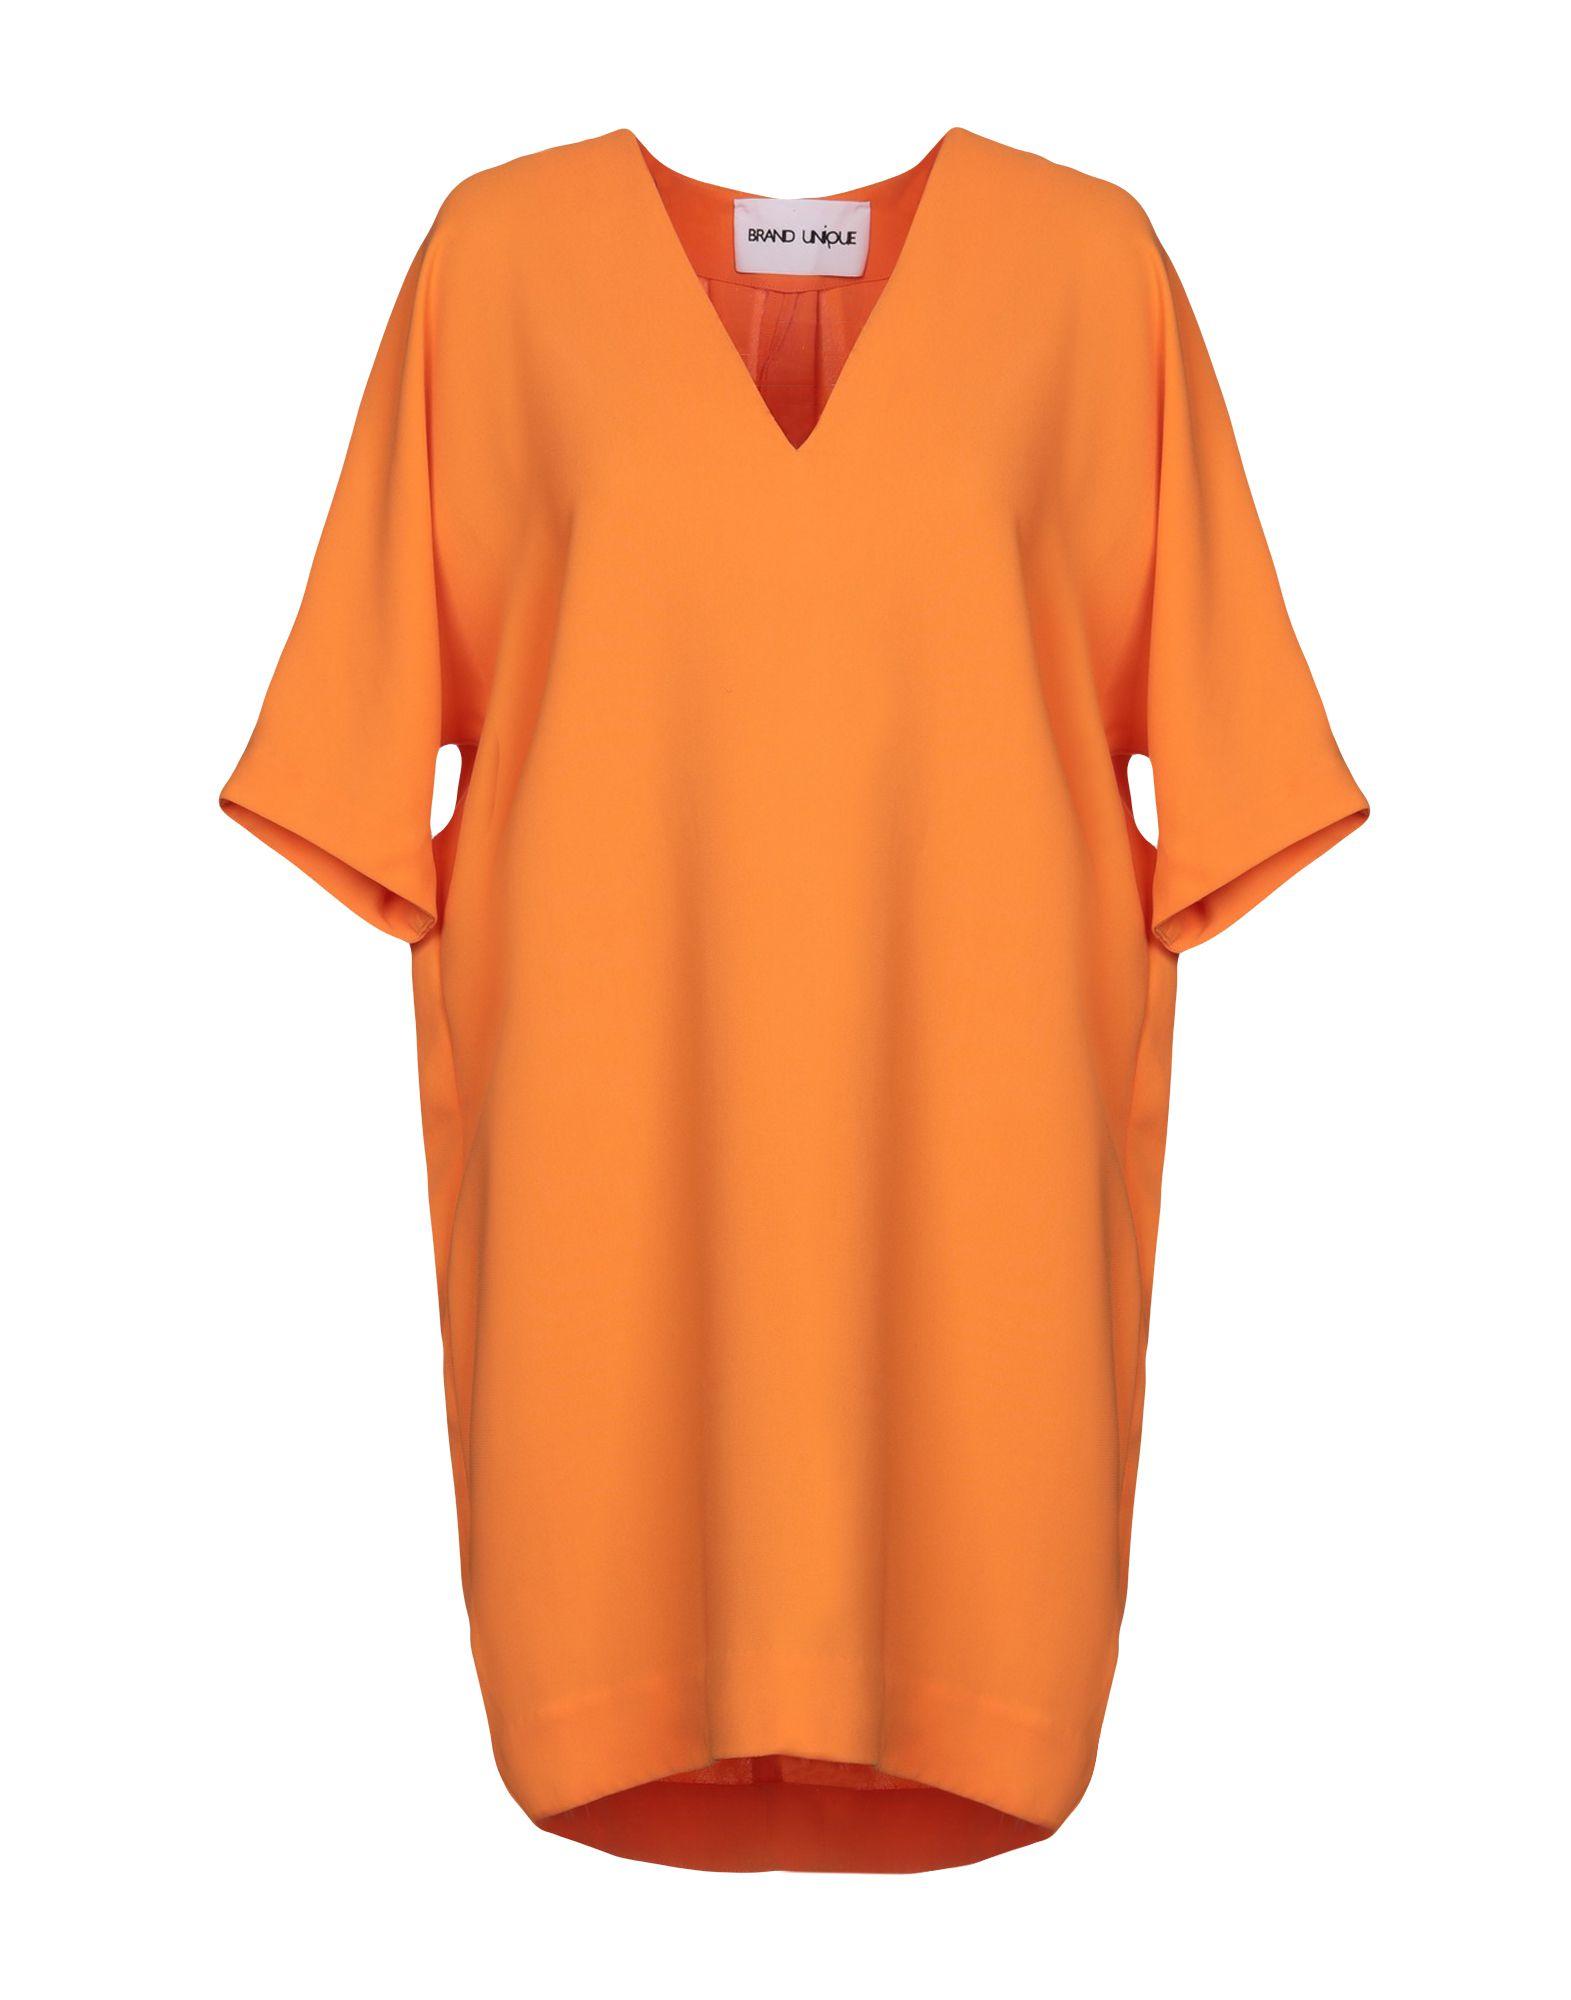 BRAND UNIQUE Короткое платье женское платье e unique k30 2015 vestidos v